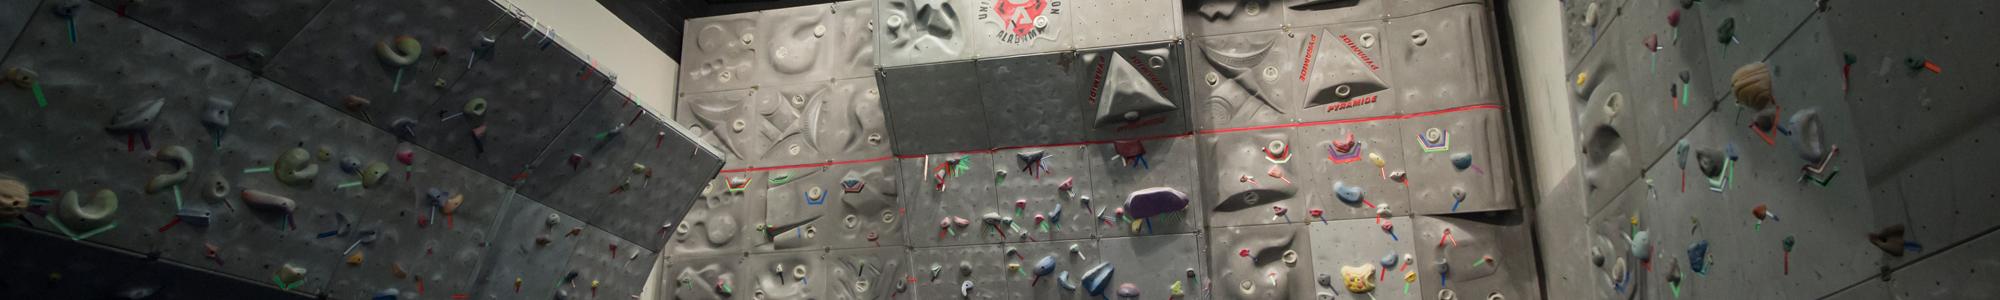 Climbing Walls - University Recreation